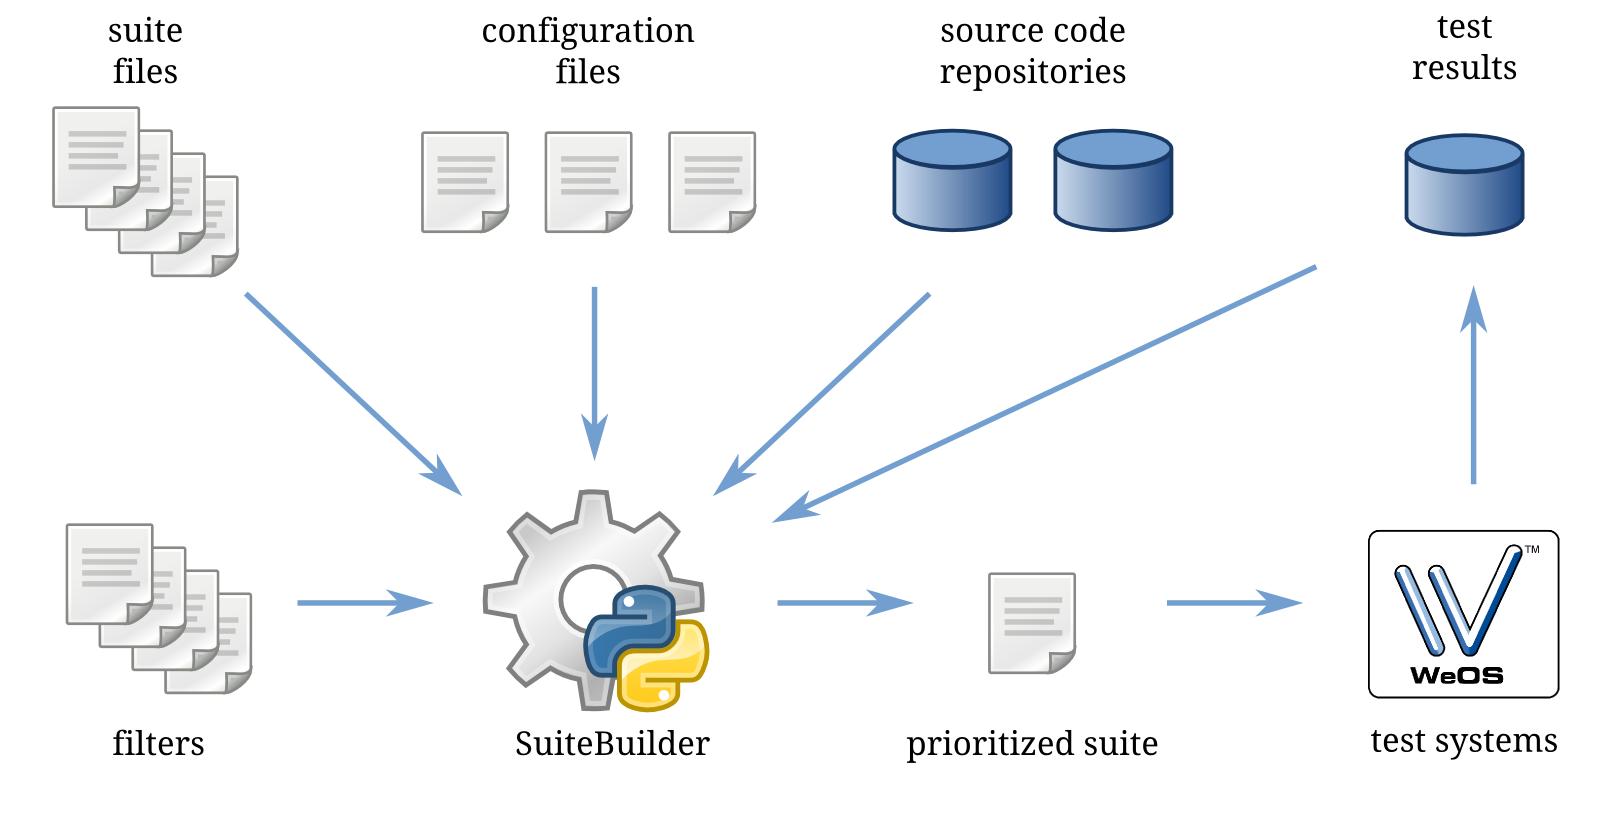 http://pererikstrandberg.se/publications/suitebuilder-overall-flow.png